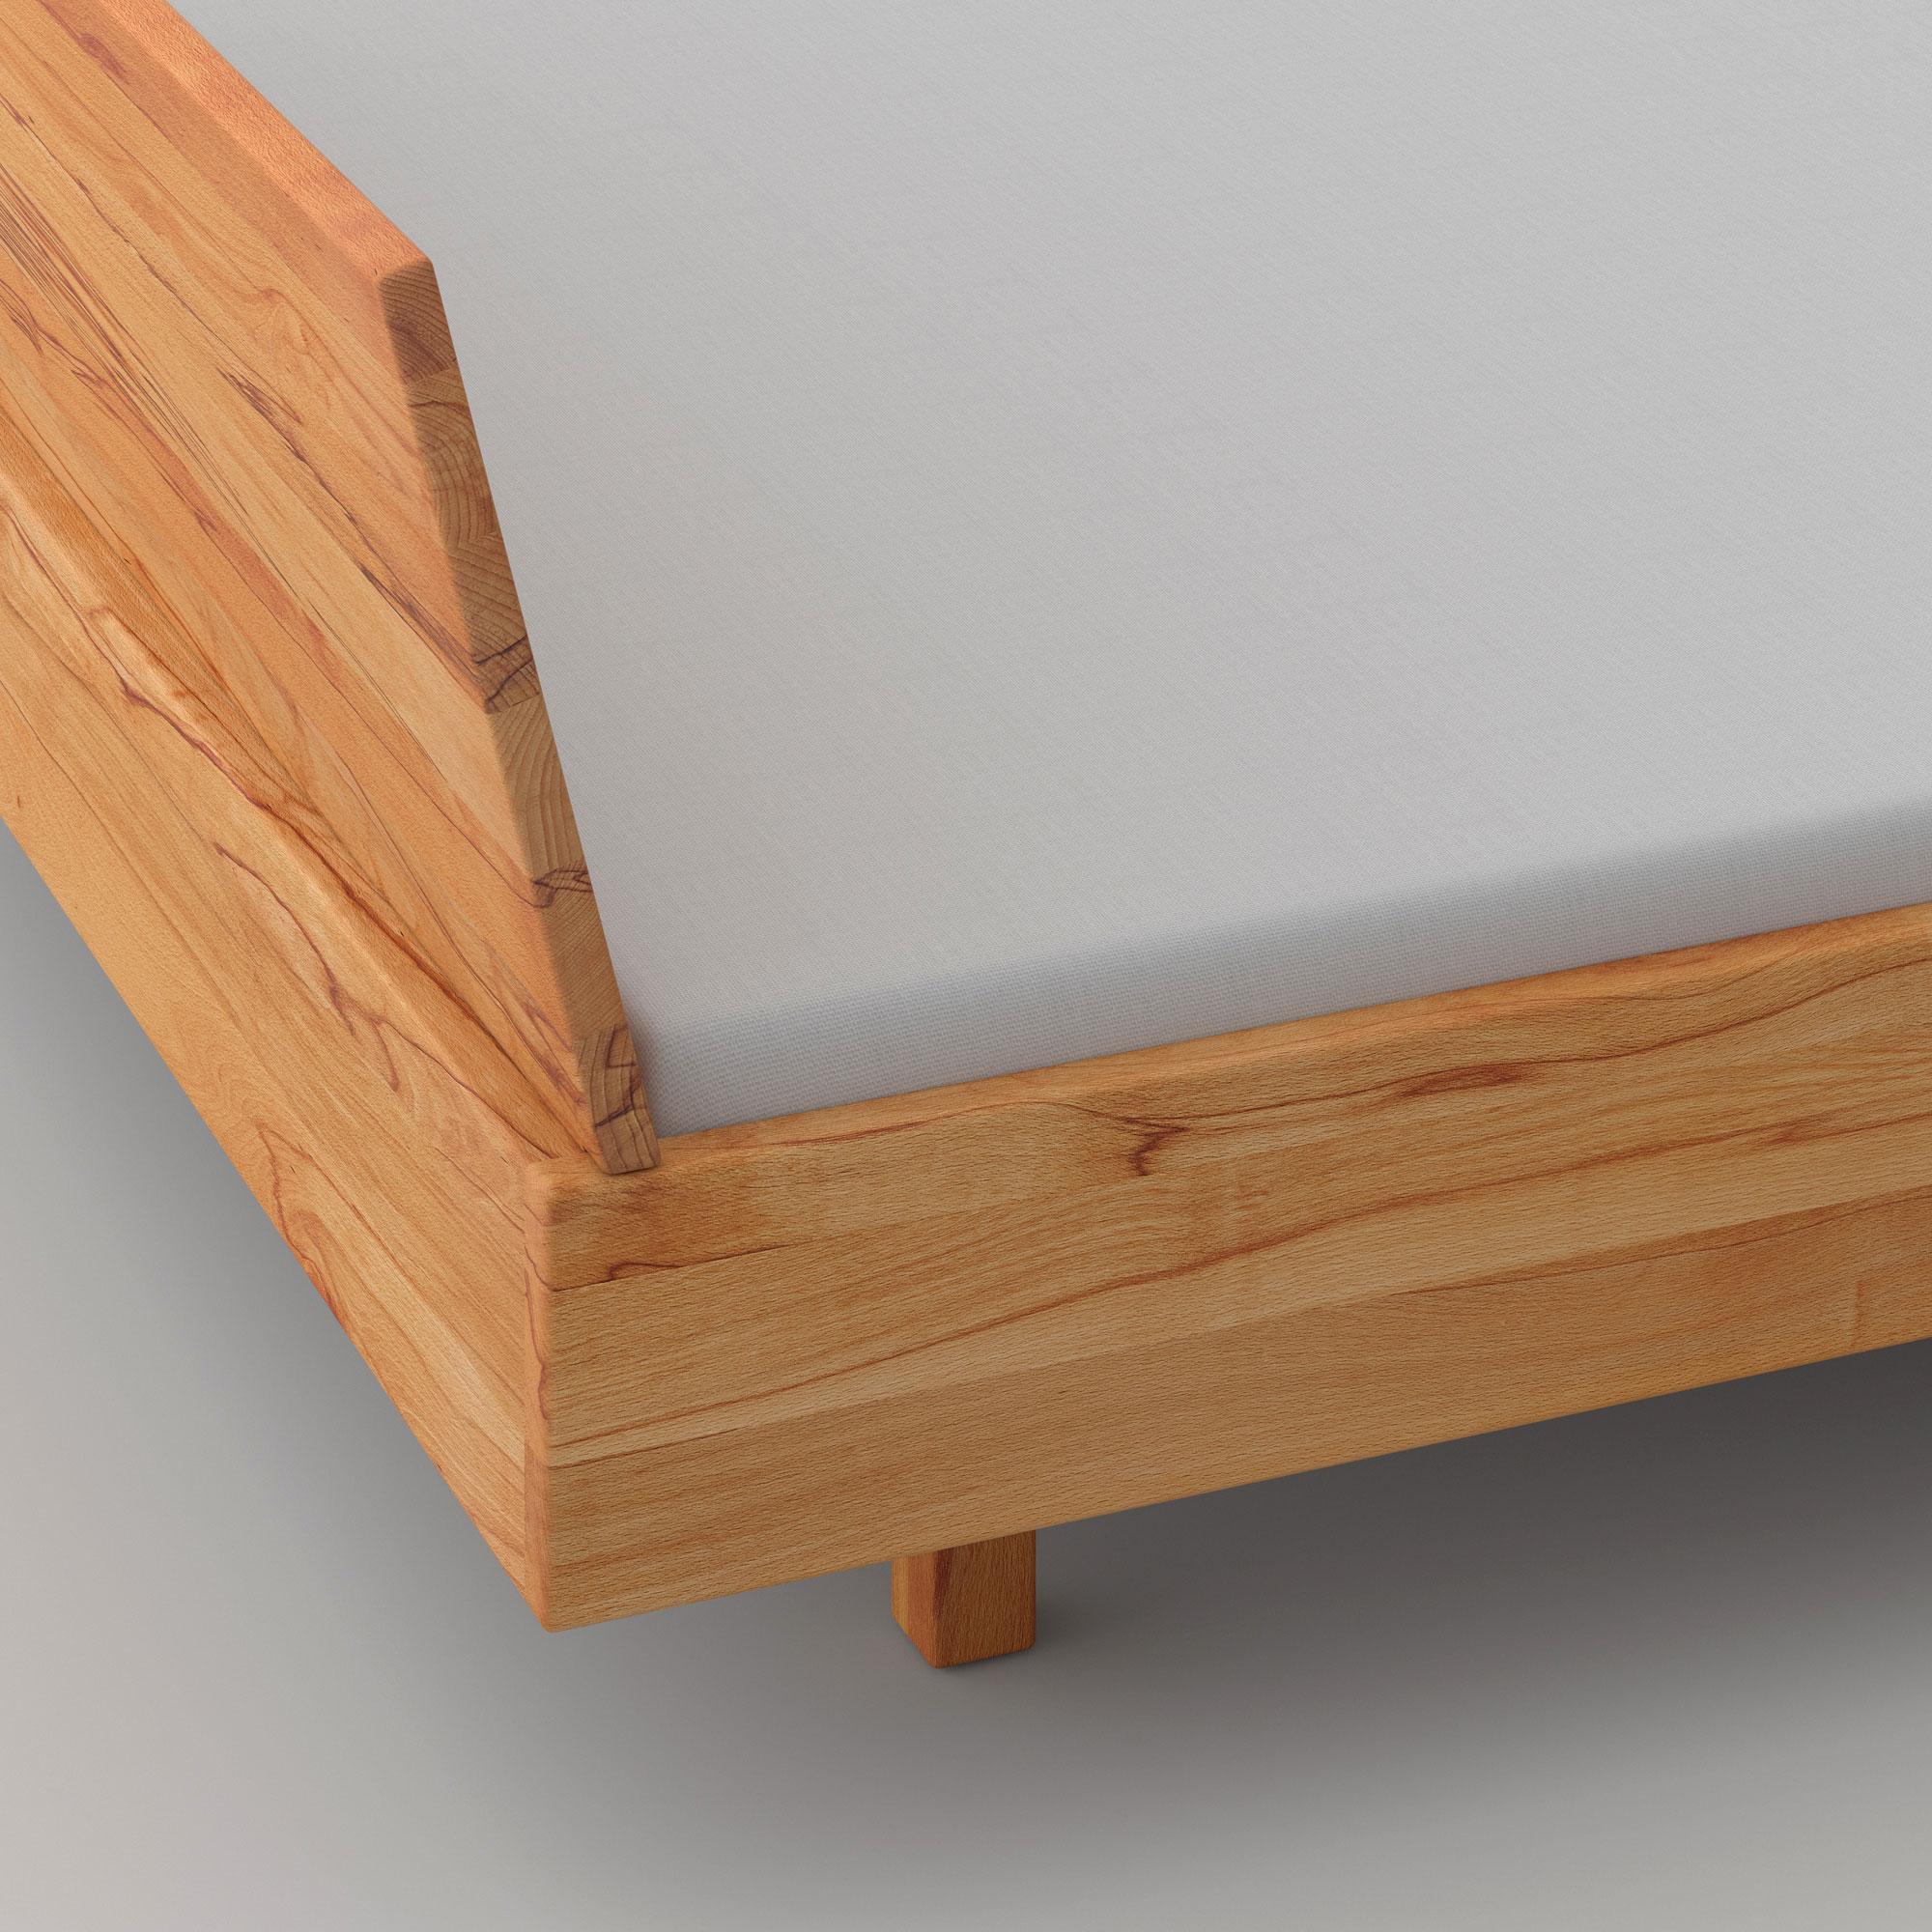 Abgerundete Ecken Massivholzbett QUADRA SOFT Maßgefertigt aus Massivholz von vitamin design